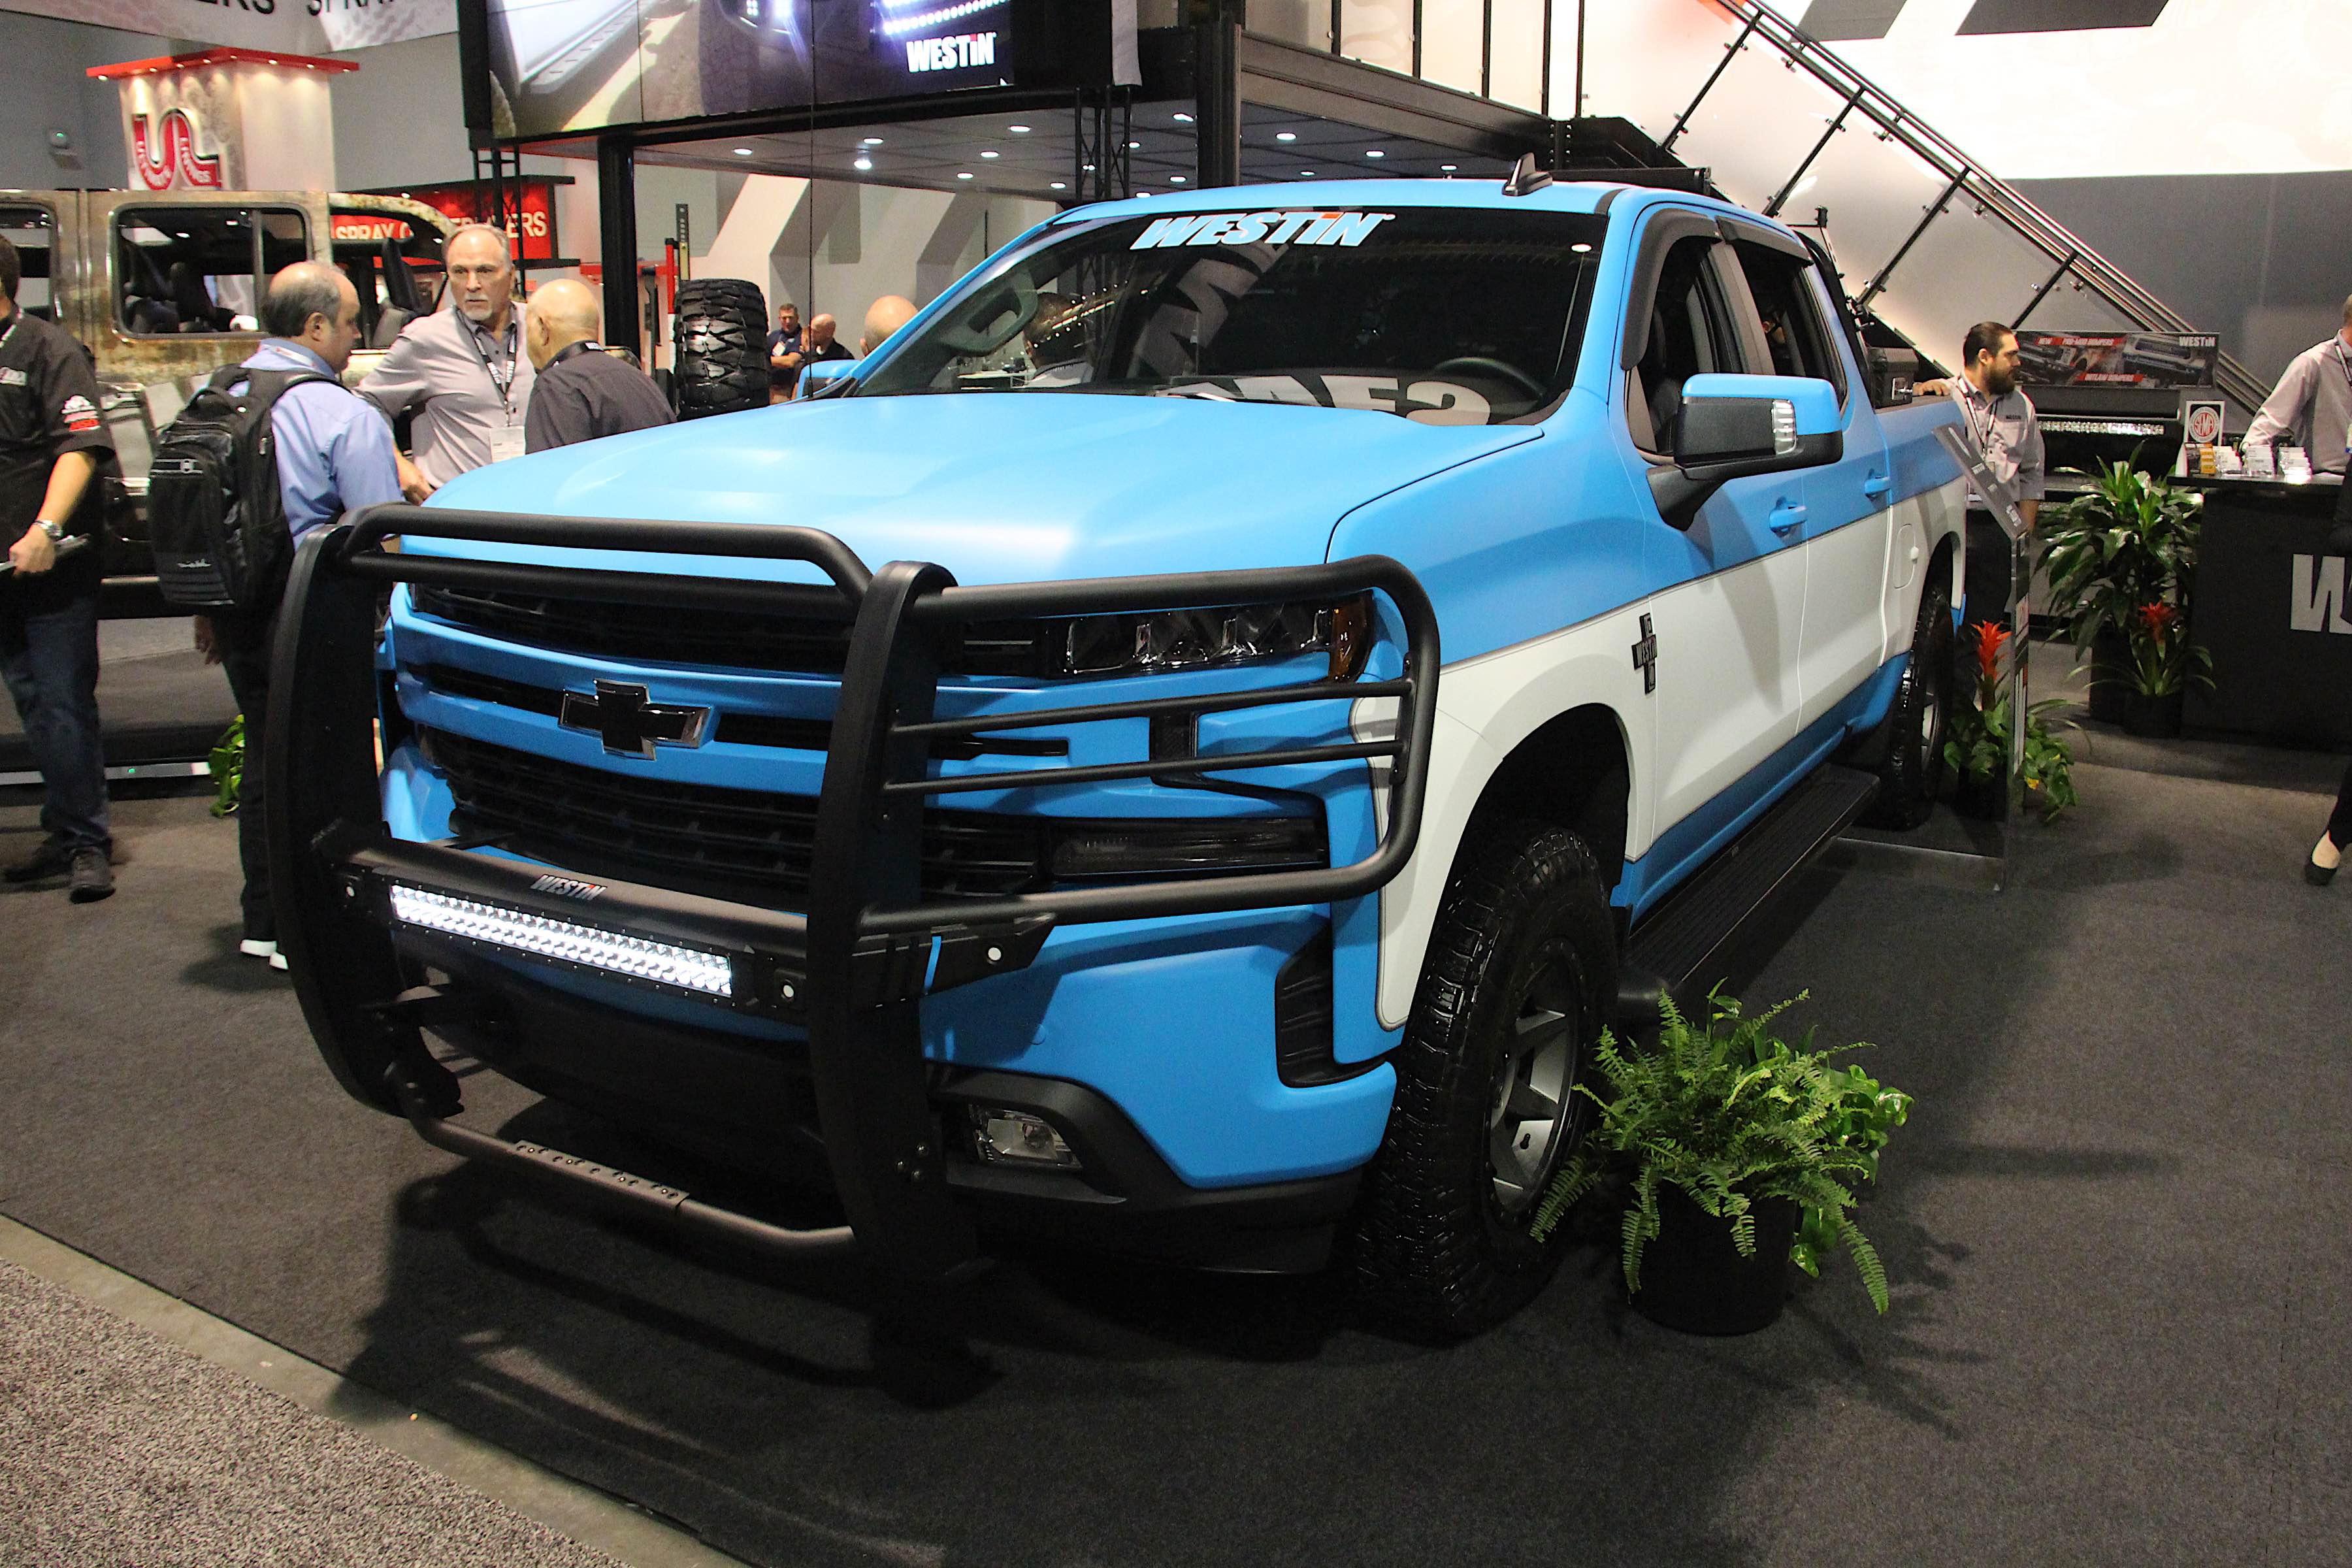 SEMA 2018: Westin Reveals New Bumpers For Trucks